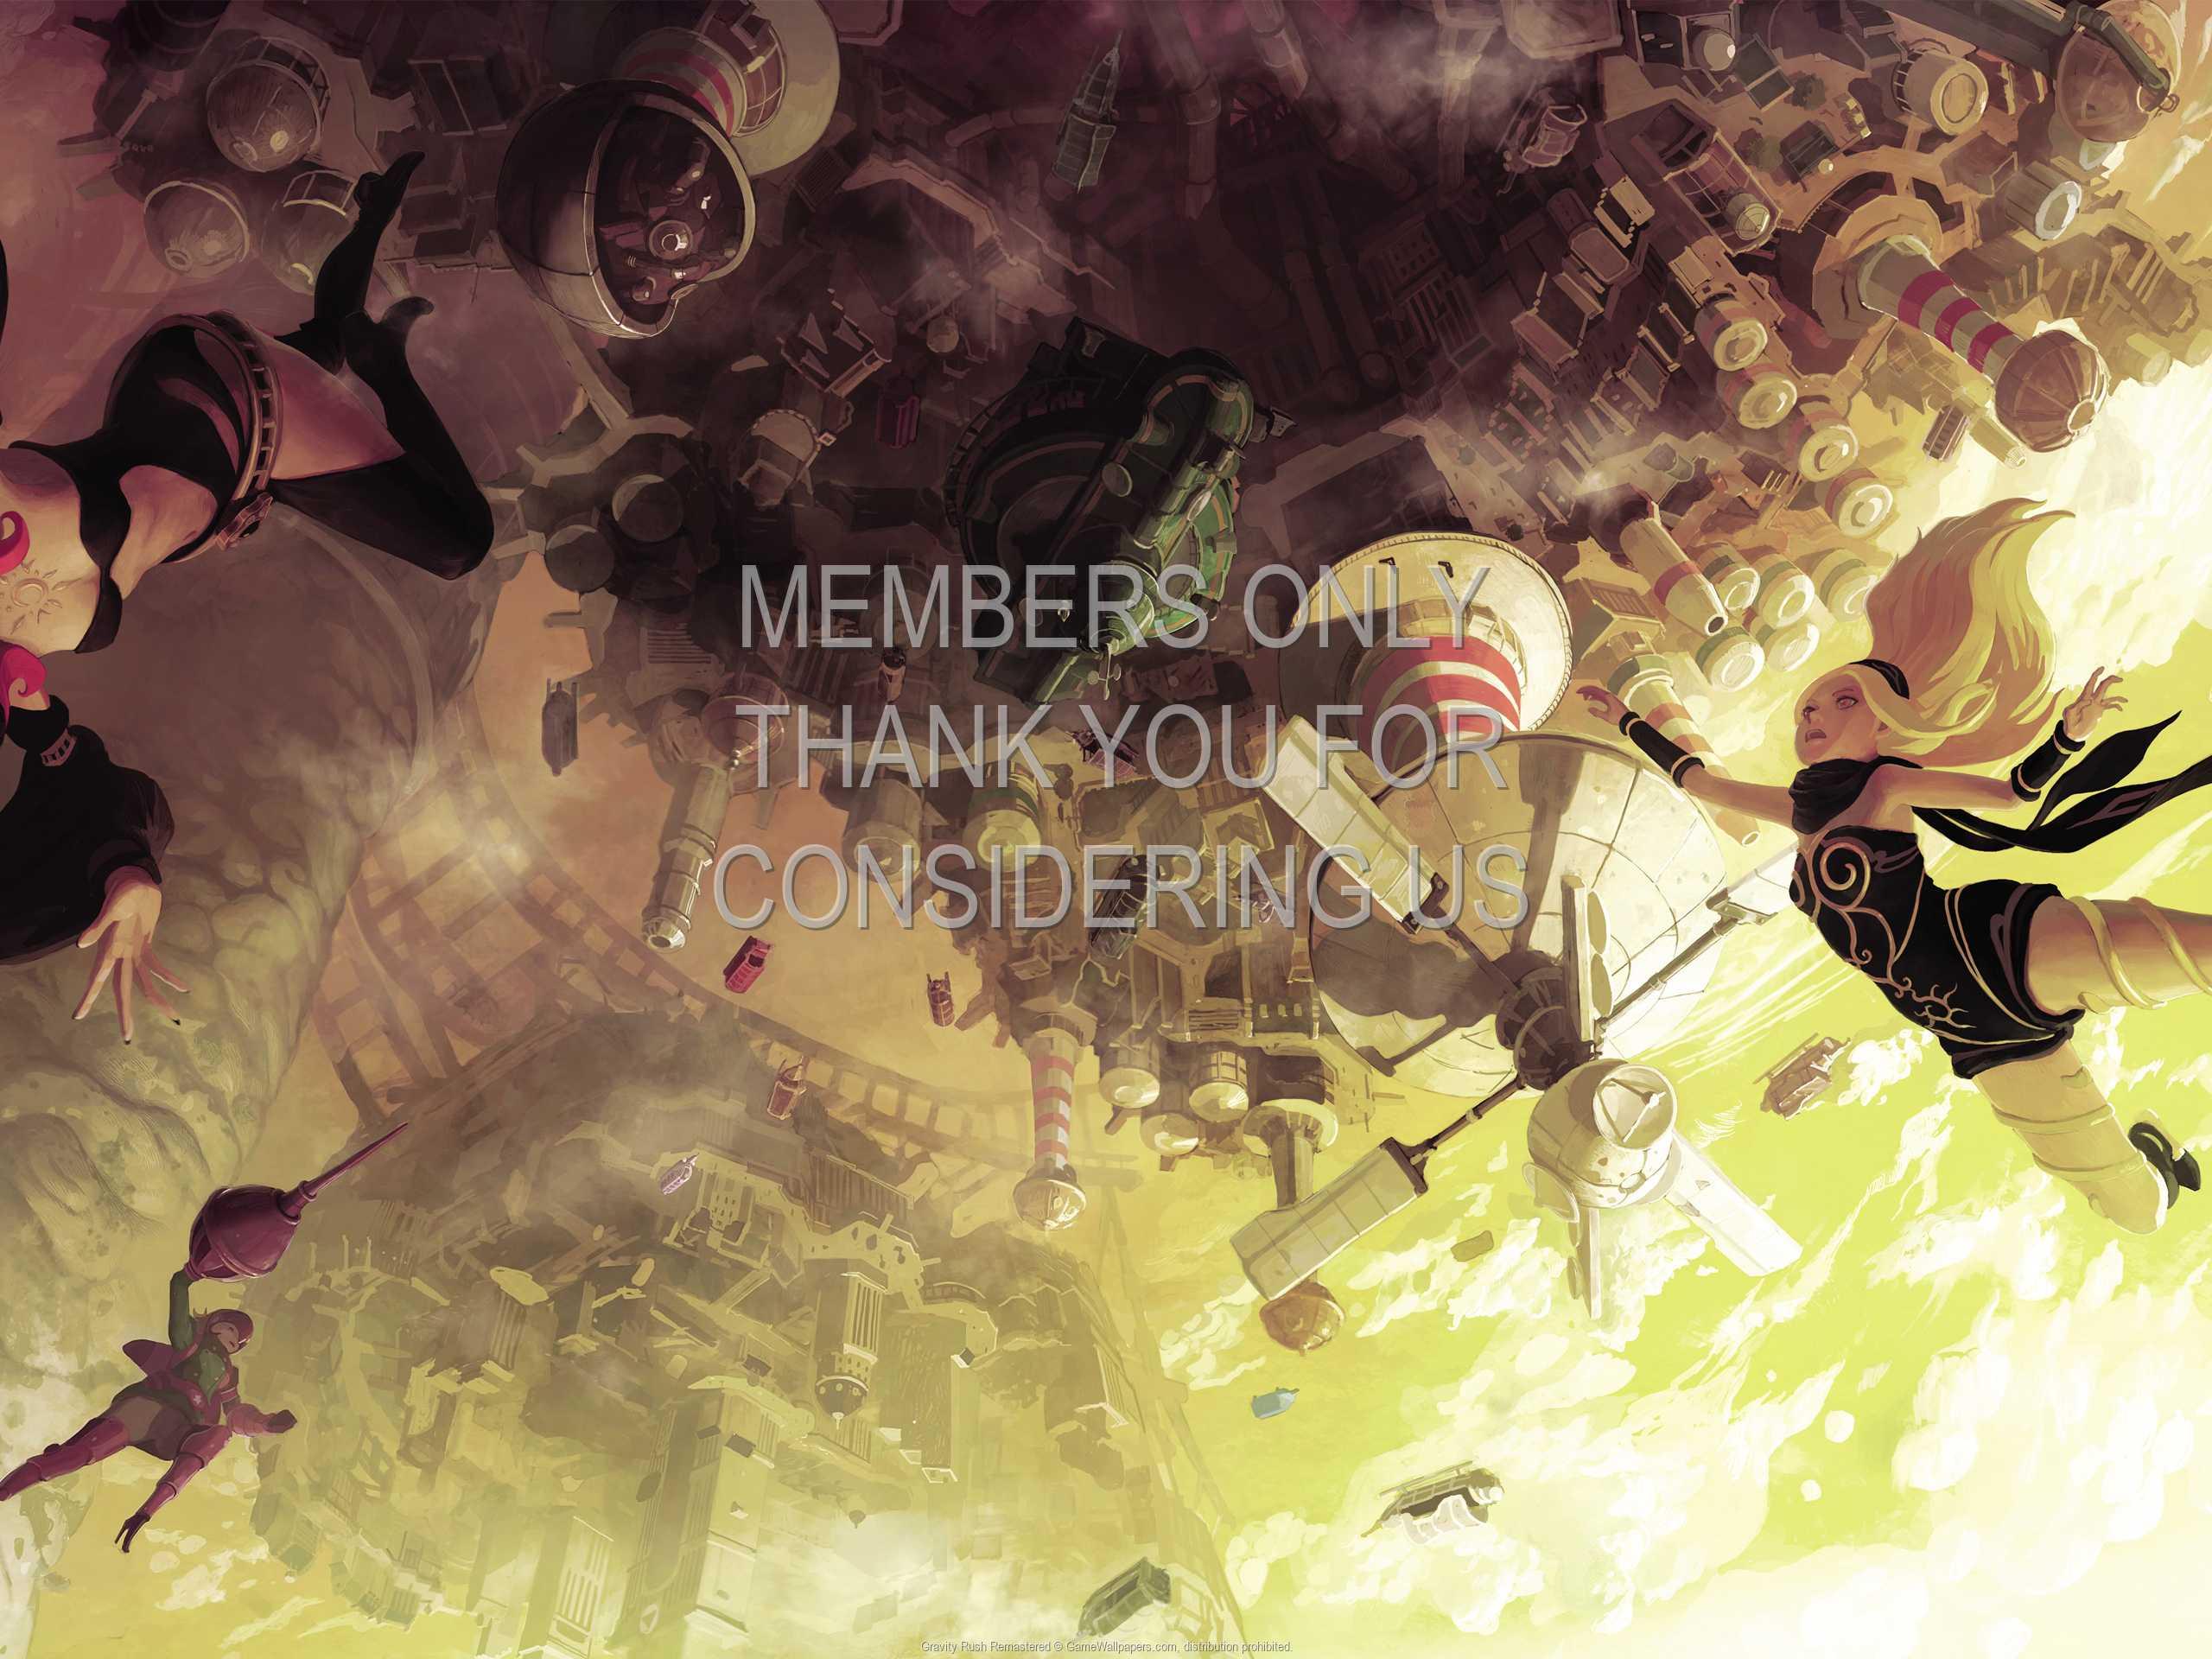 Gravity Rush Remastered 1080p Horizontal Mobile wallpaper or background 02